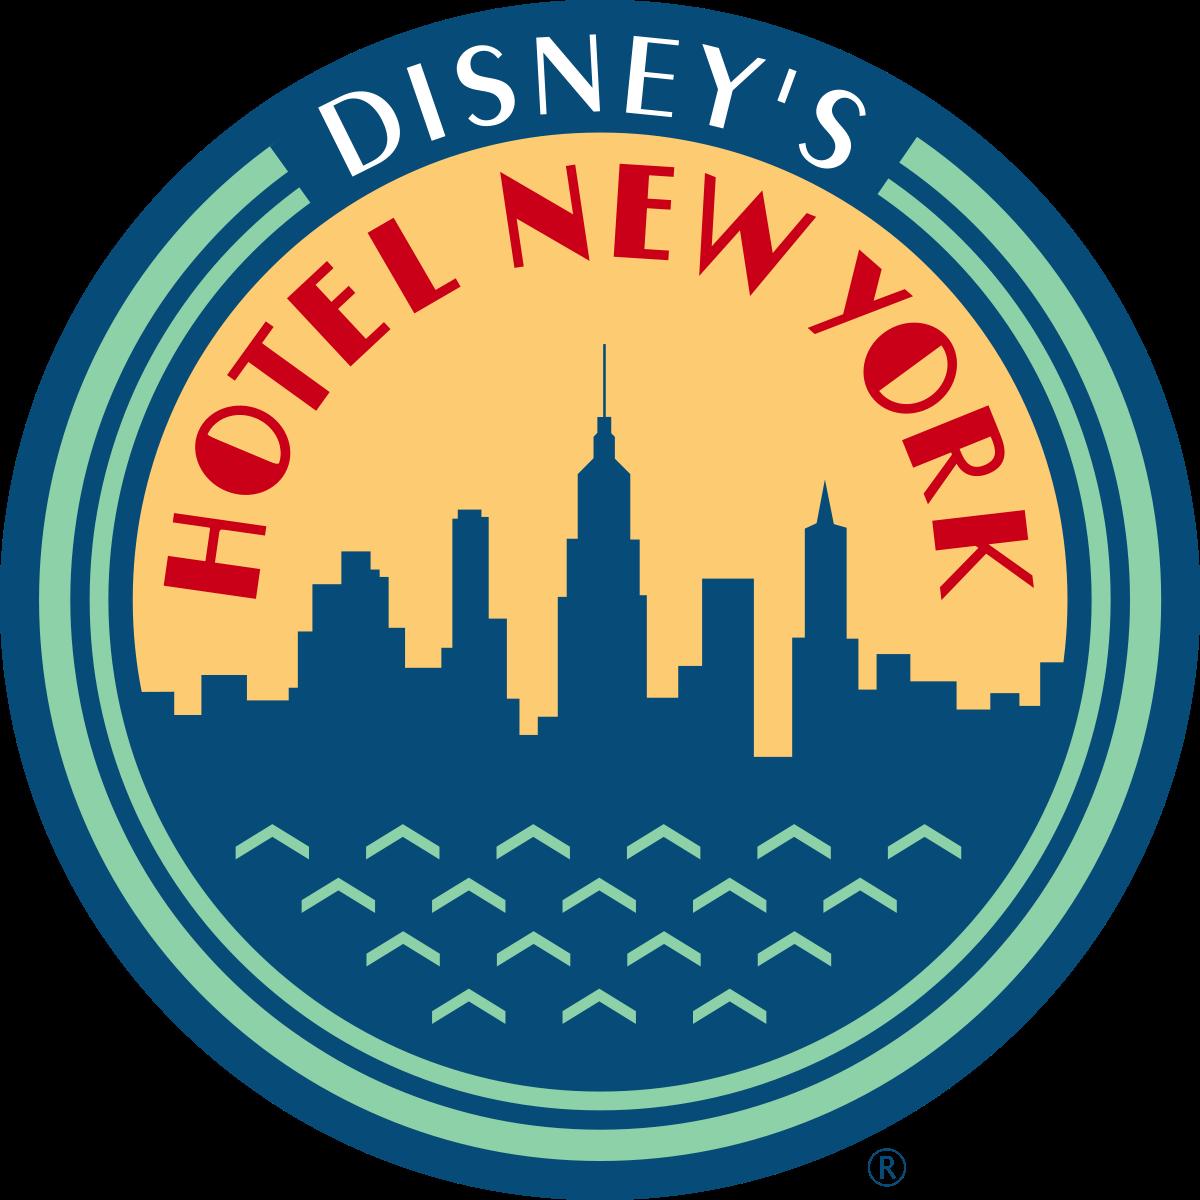 Disney S Hotel New York Wikipedia Disney Hotels Disneyland Paris Hotel Logo